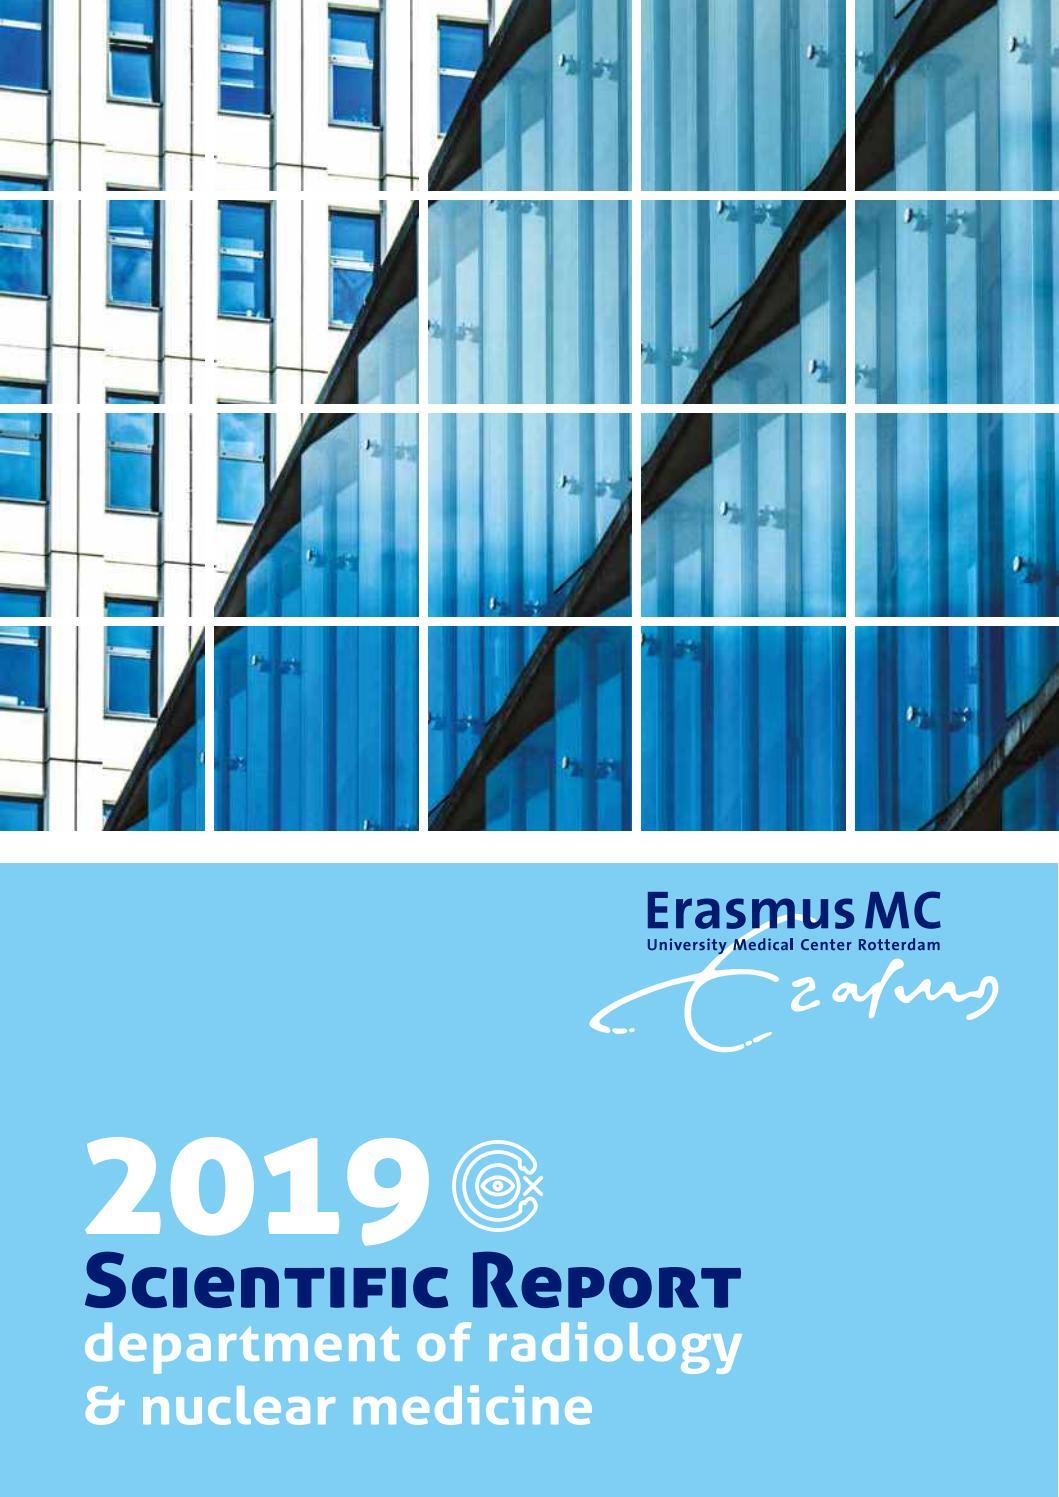 scientific report 2019 by erasmus mc